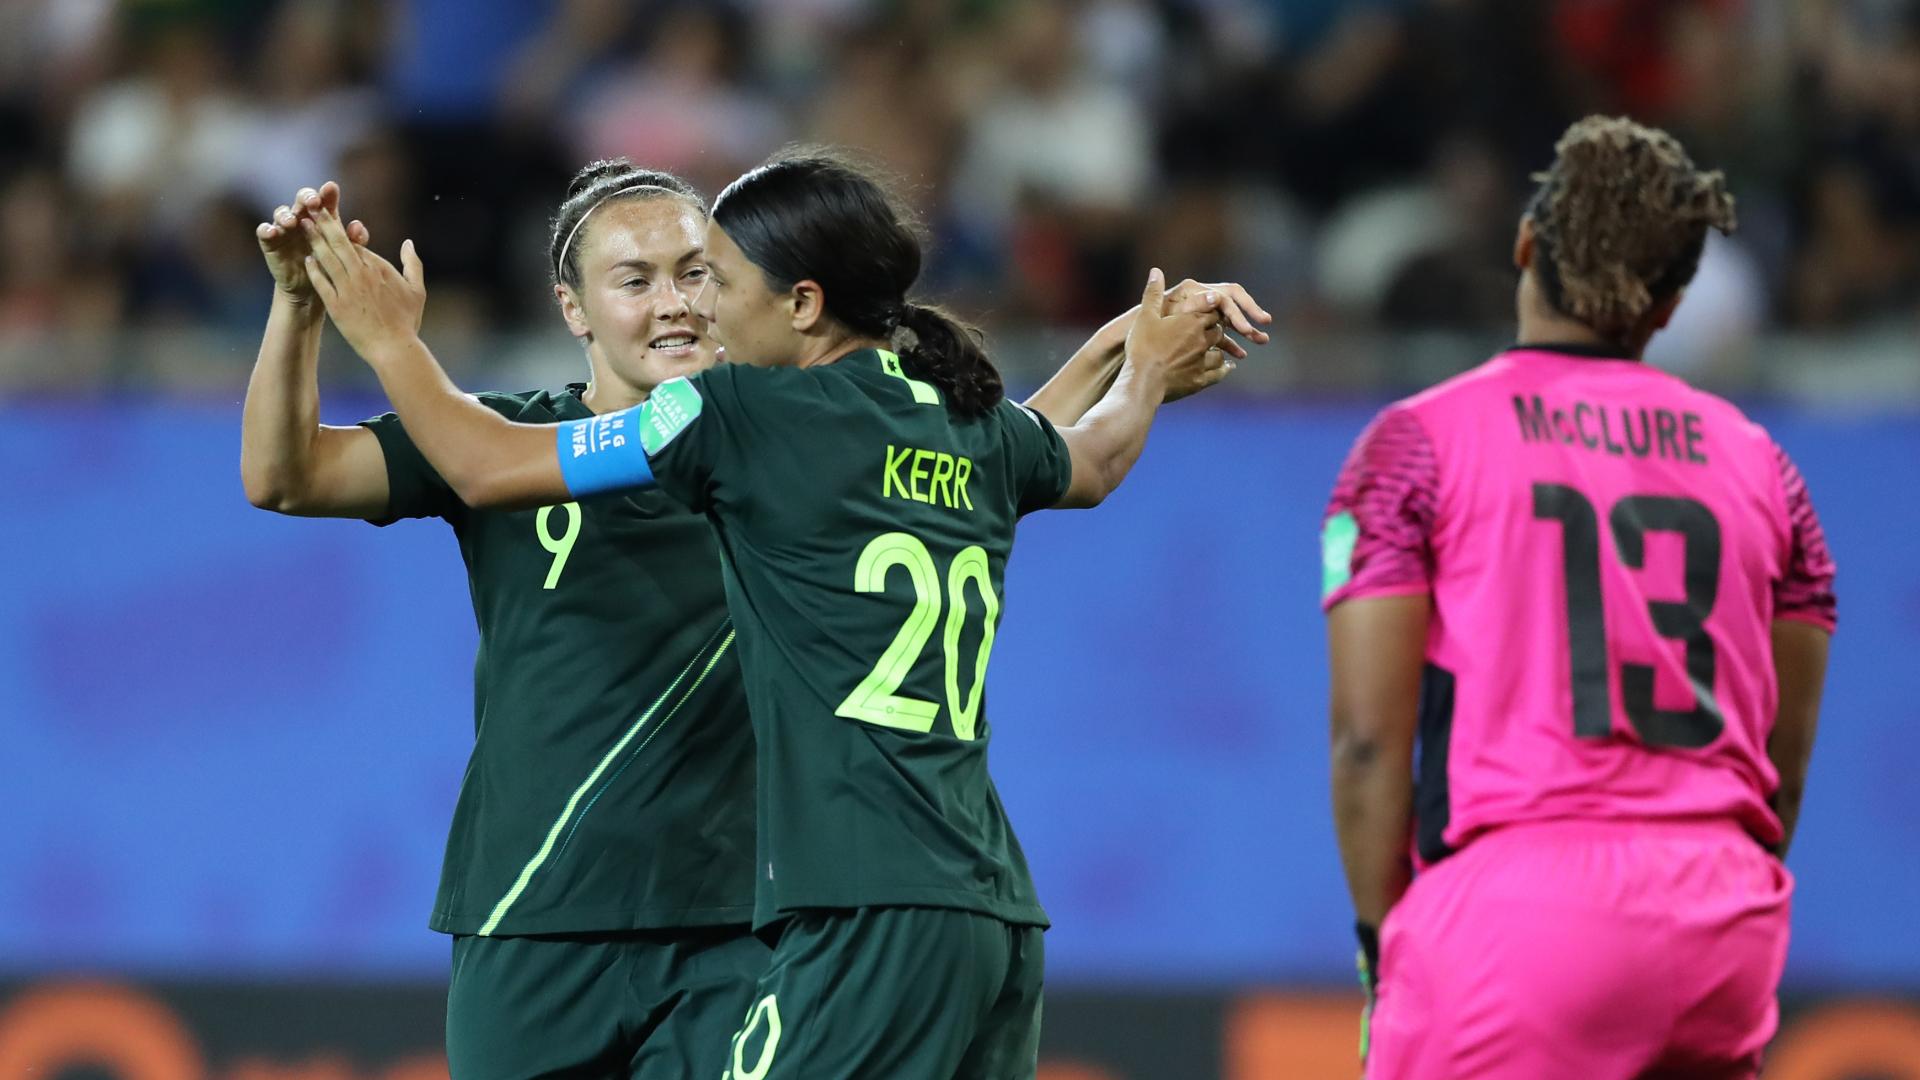 Matildas star Kerr receives stunning praise from opposition coach